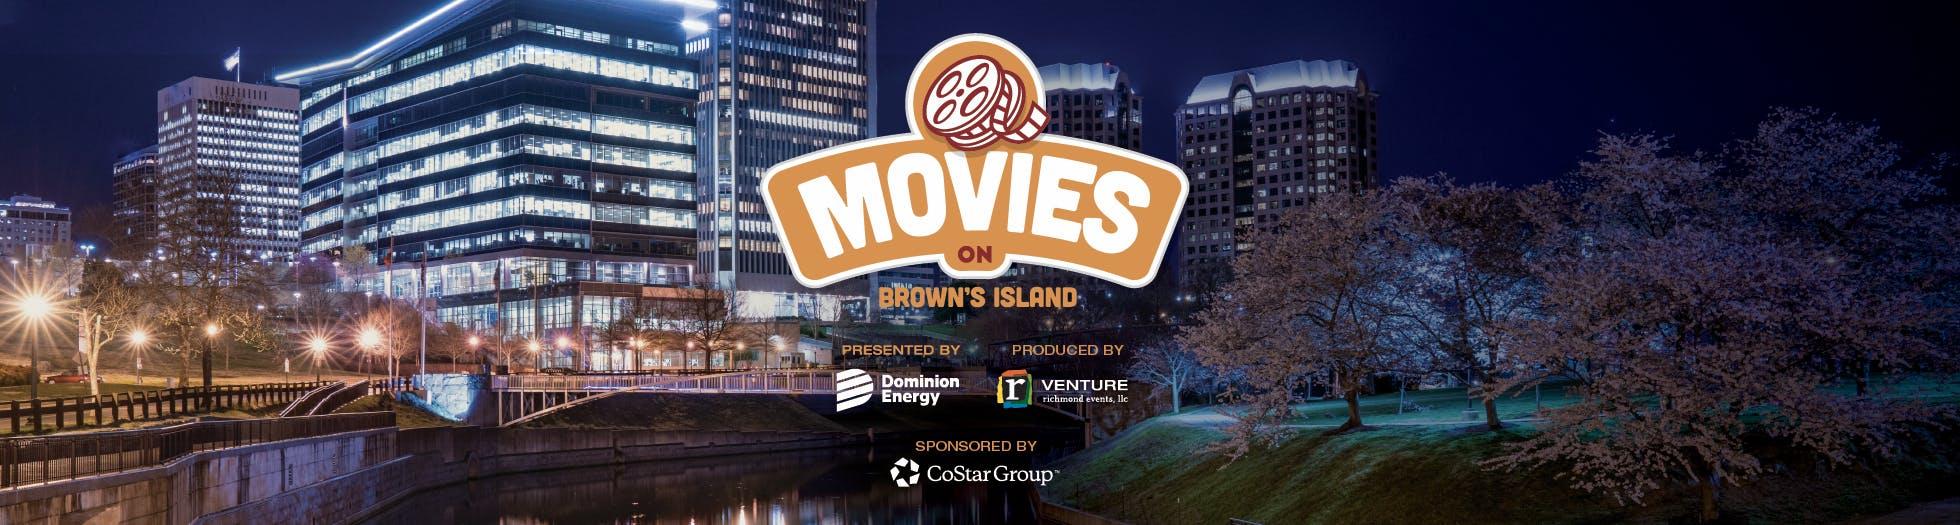 Movies on Brown's Island